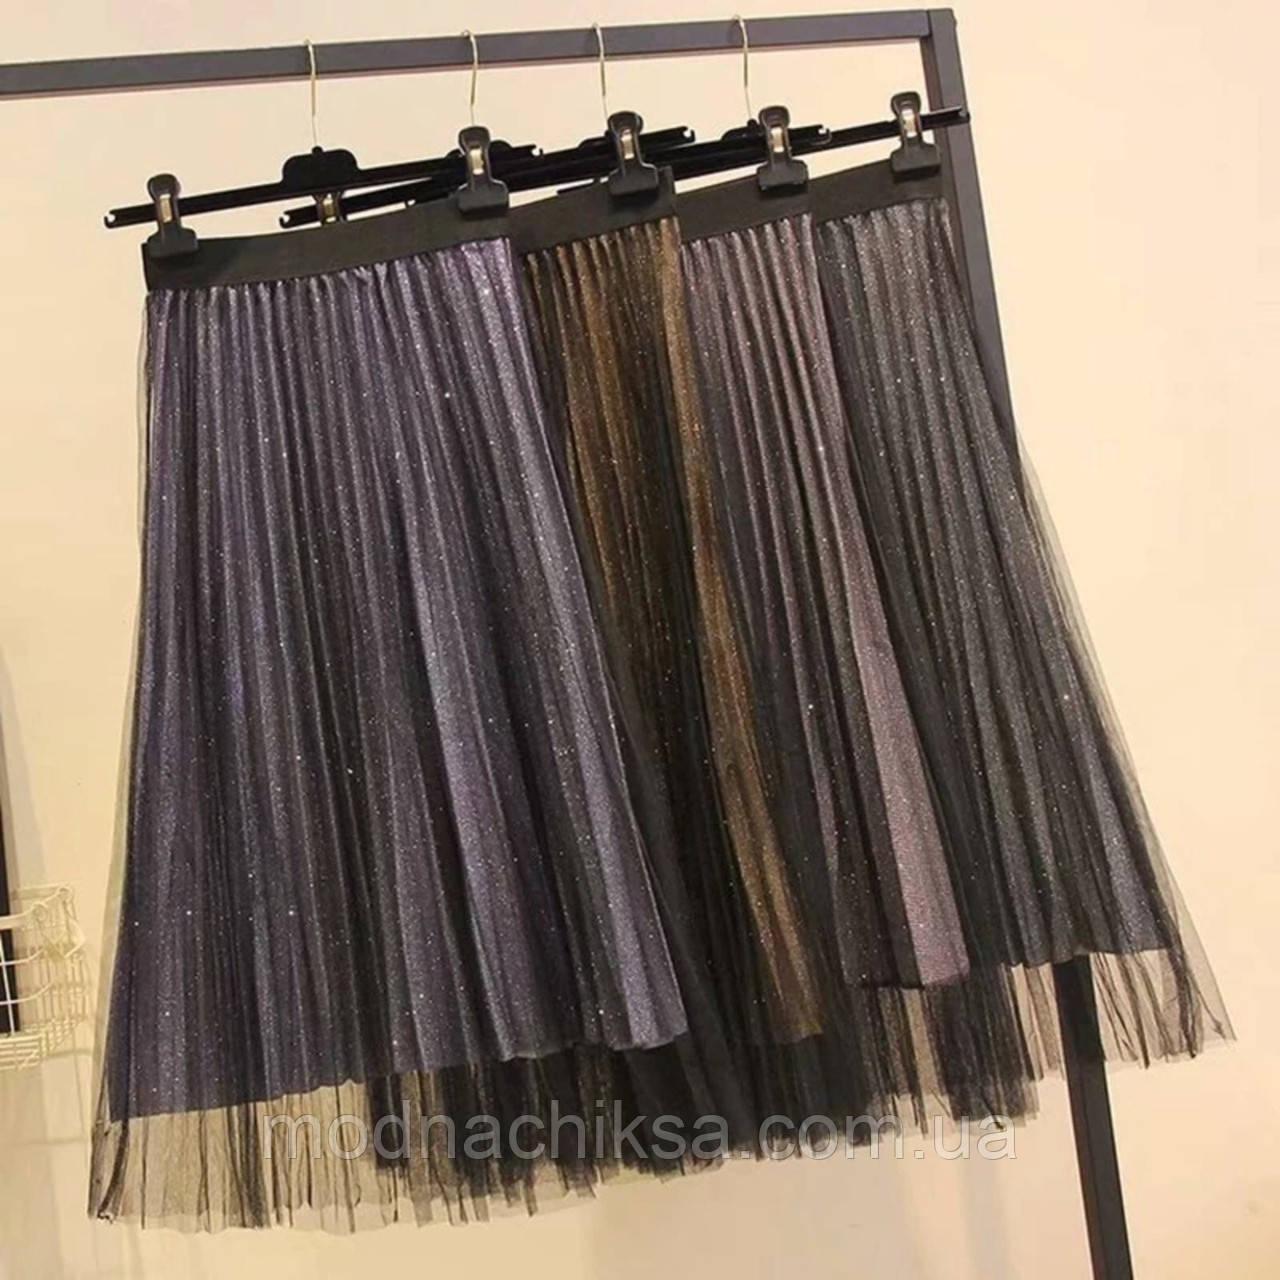 Нарядная юбка комбинирована фатином